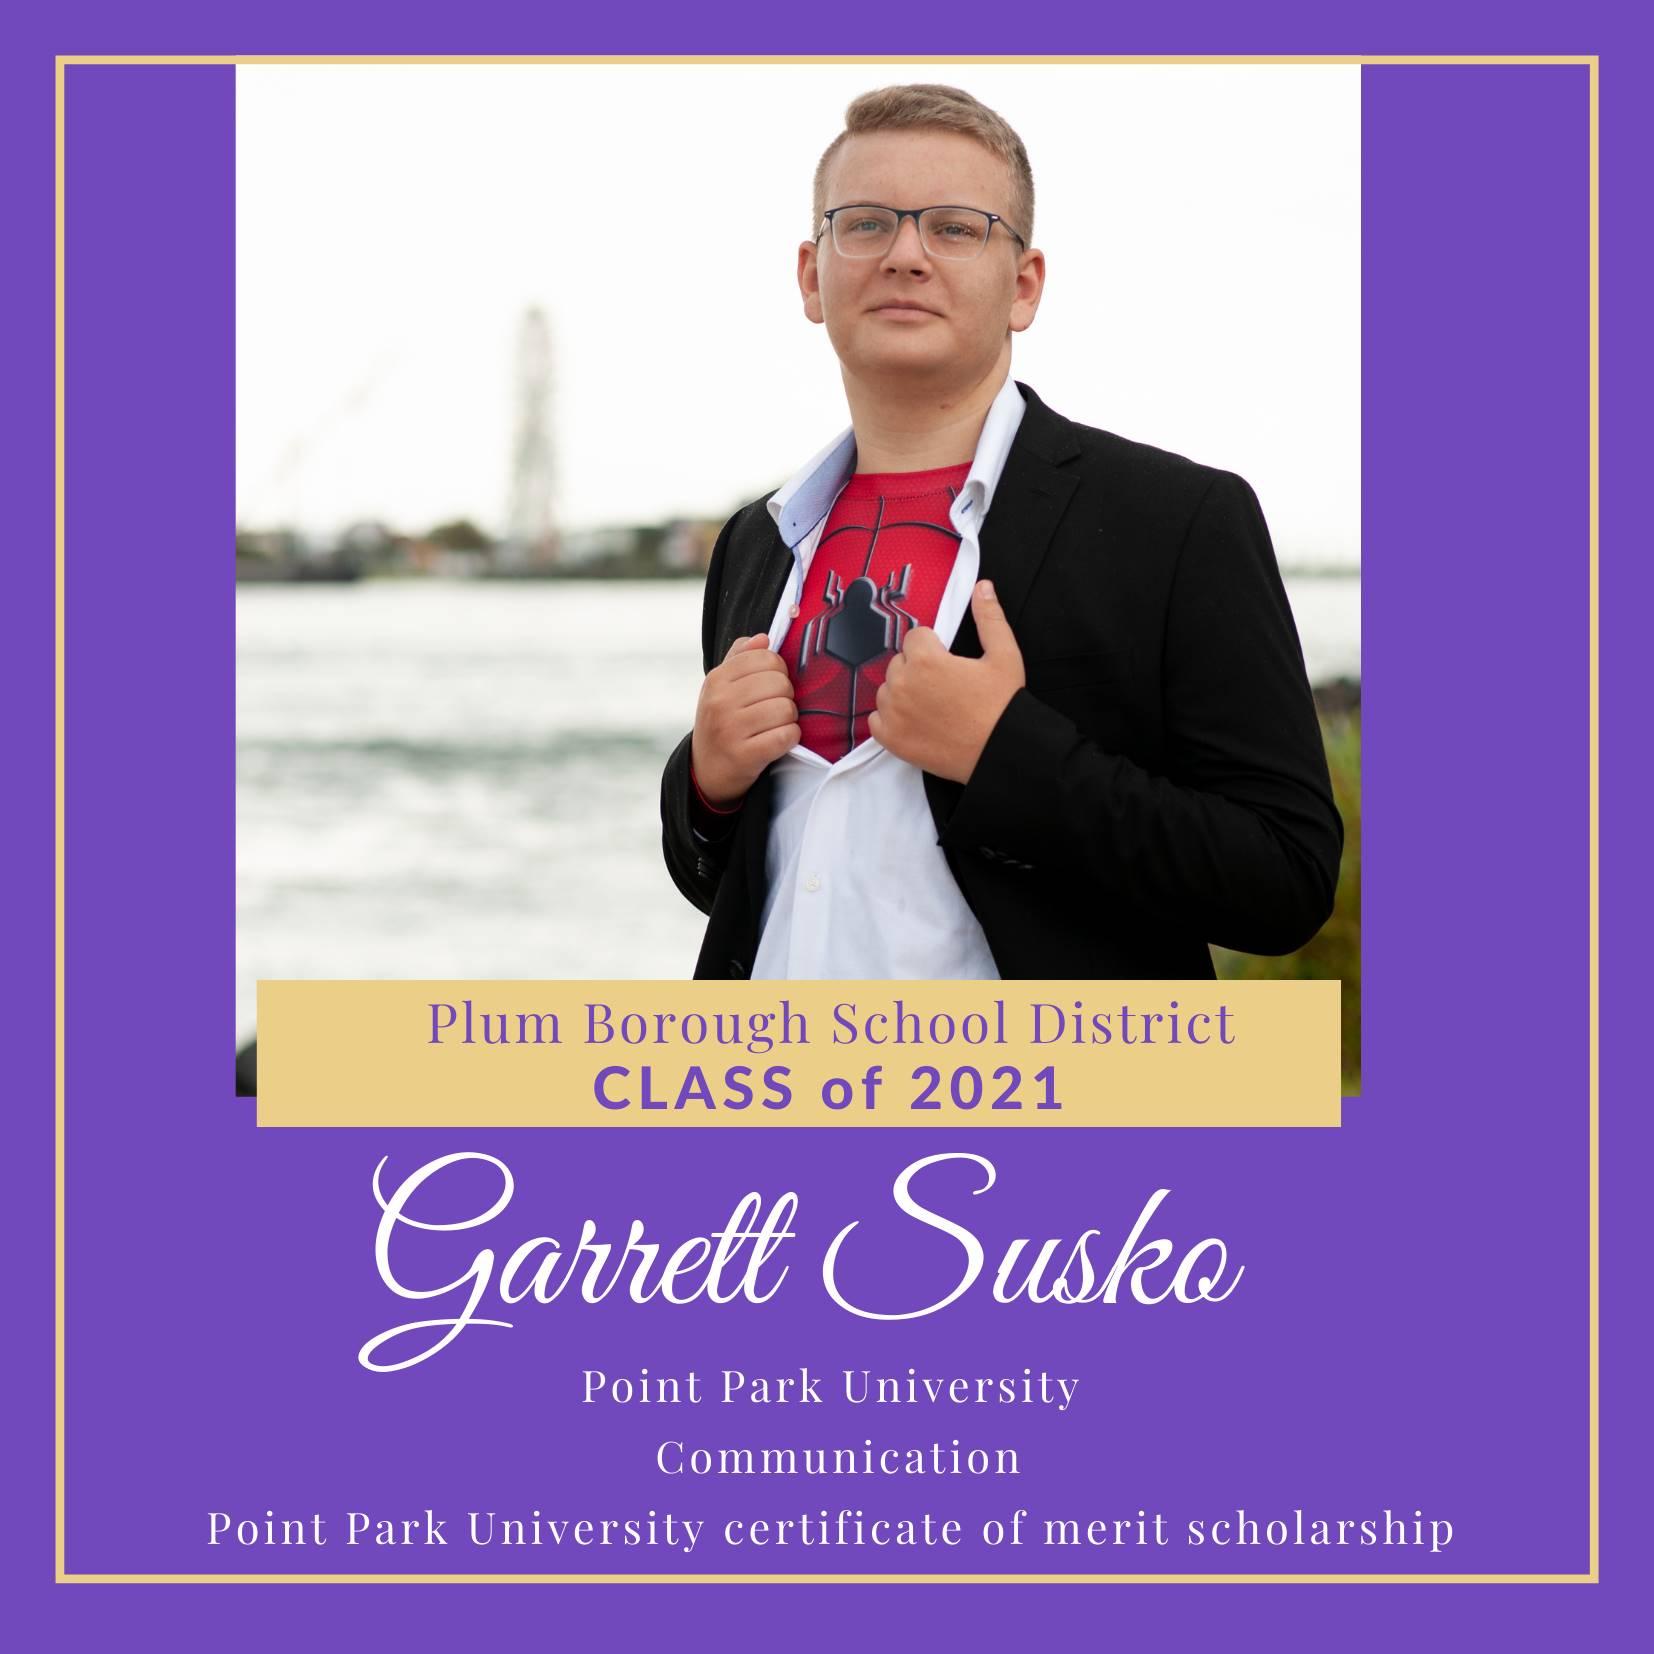 Congratulations to Garrett Susko, Class of 2021!